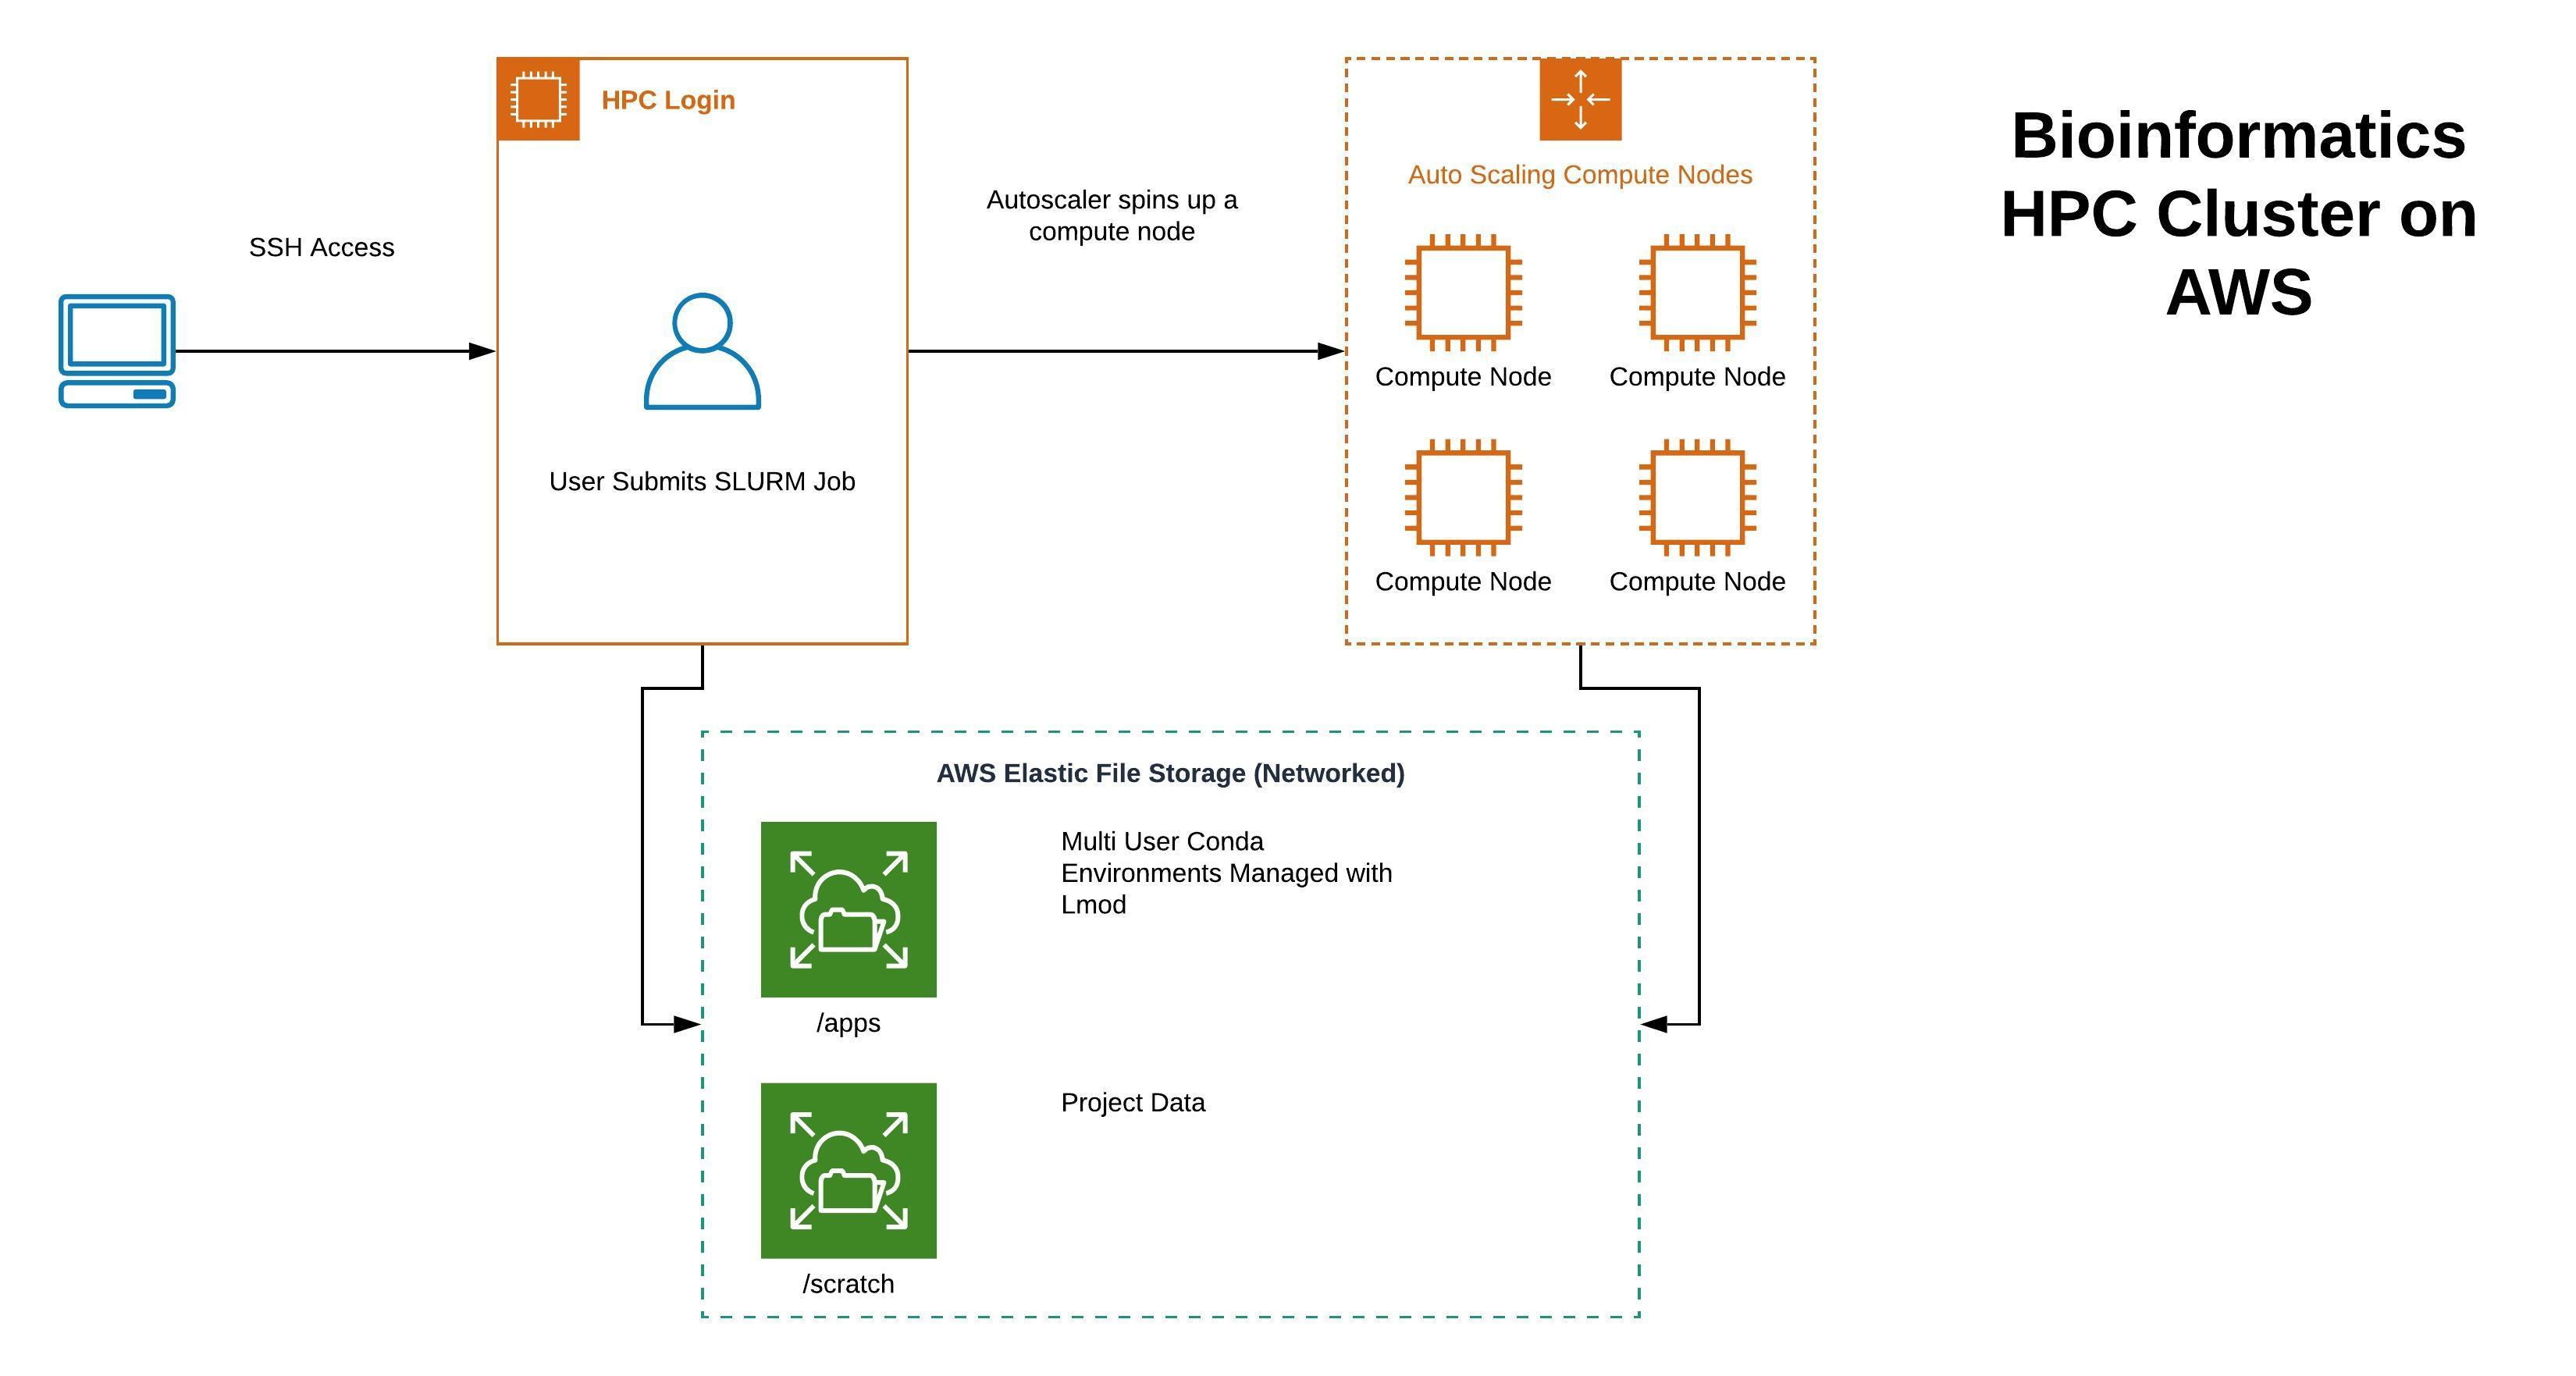 Bioinformatics HPC Cluster on AWS